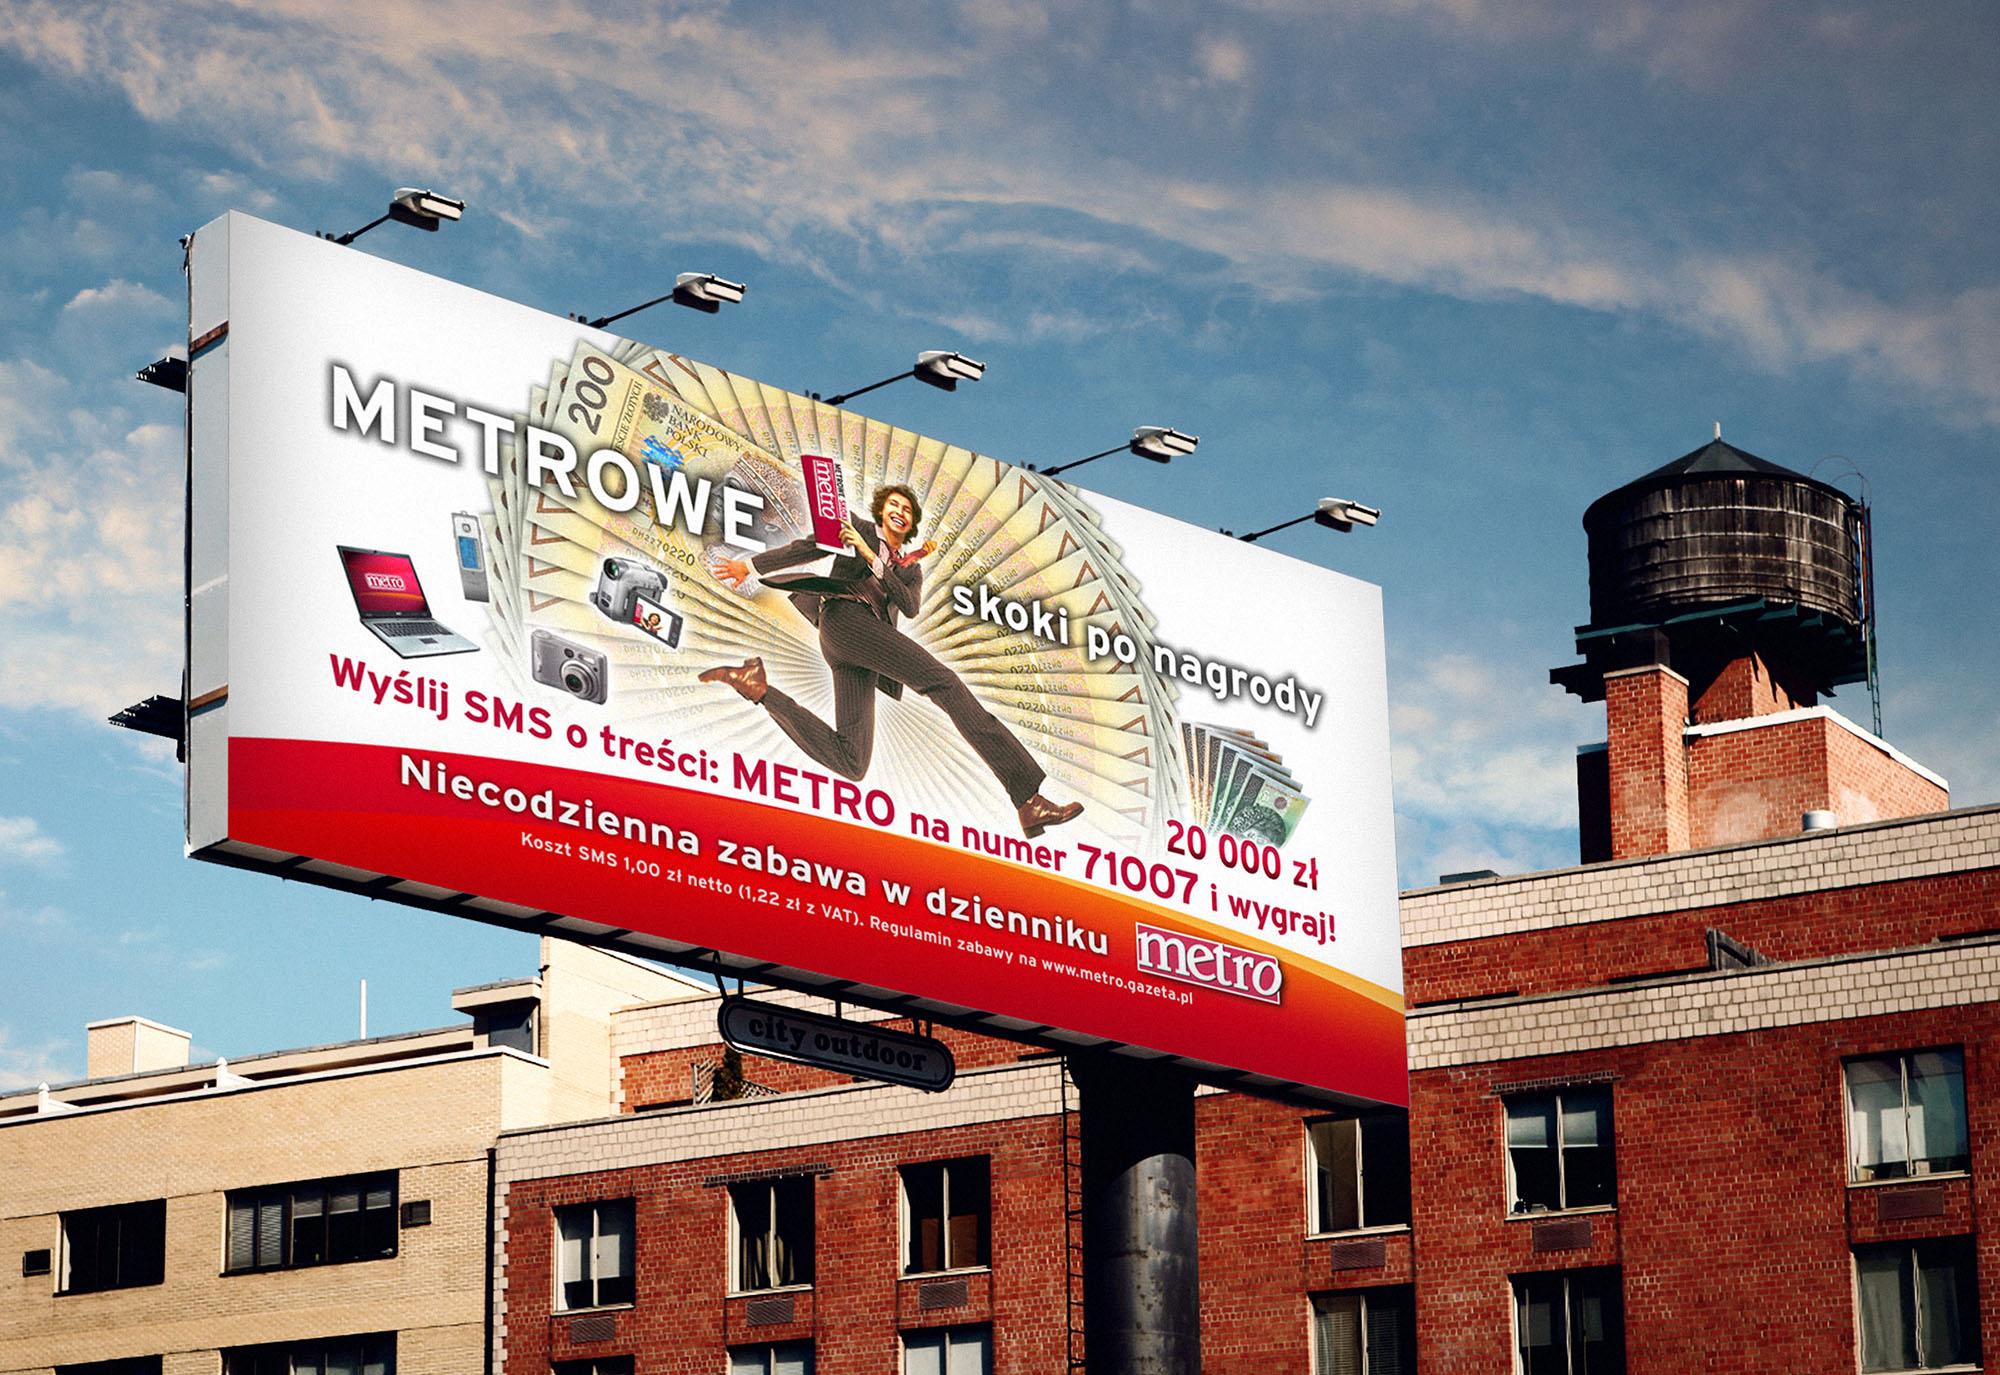 outdoor, plakat billboard reklamowy metro konkurs, projekty graficzne, design newspaper, ilustracja, concept art, key visual, art designer Ireneusz Bloch